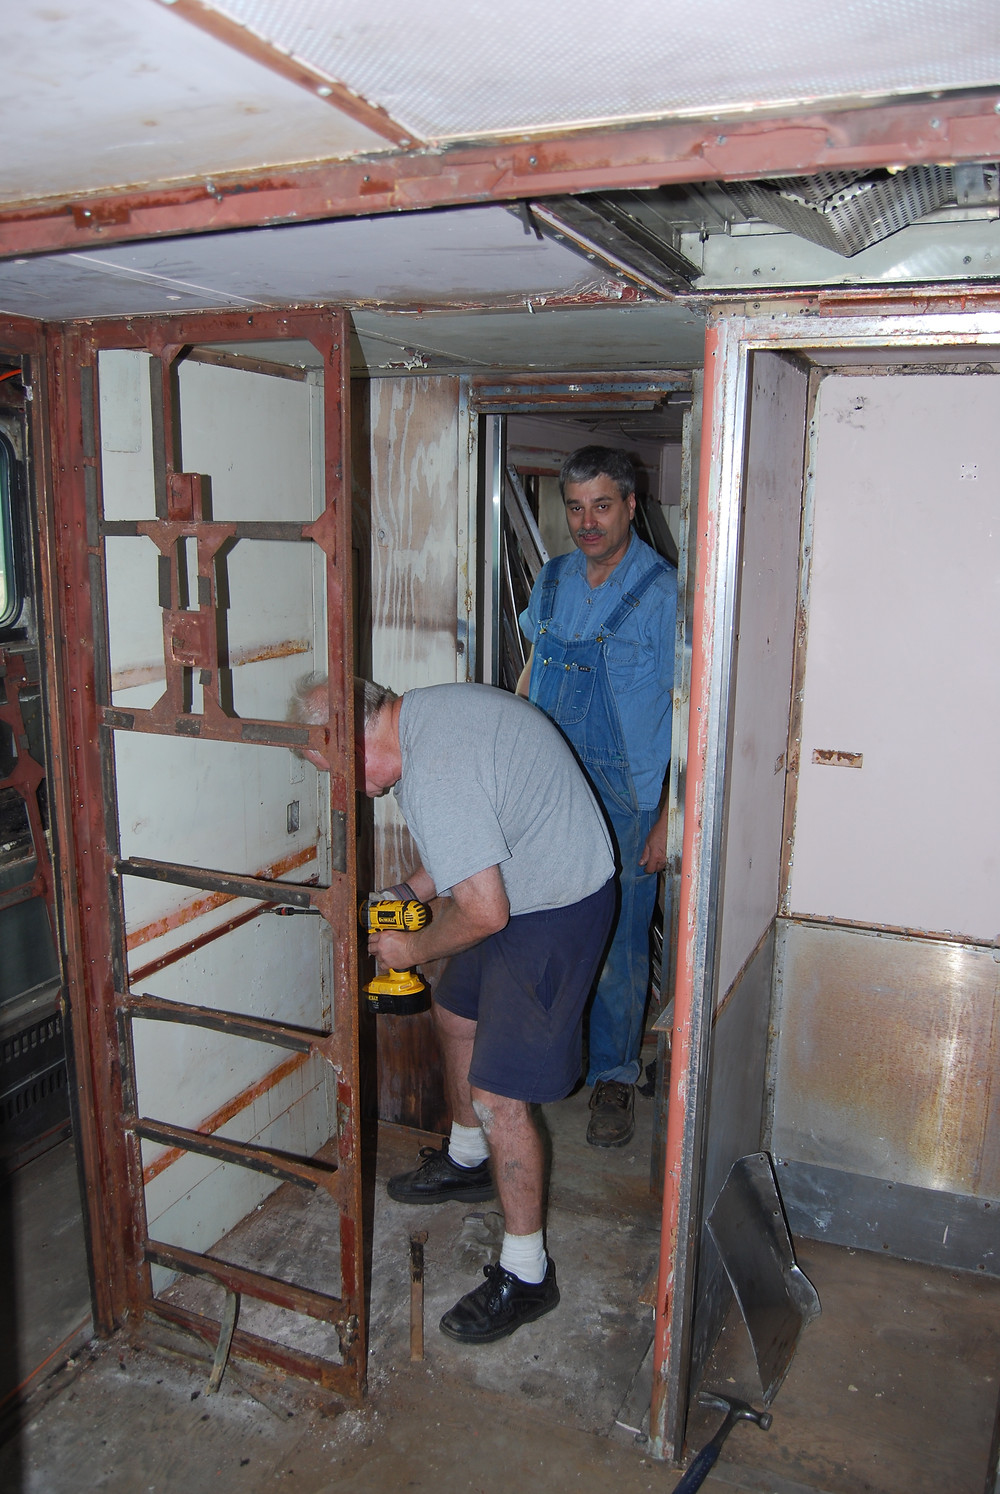 Former storage locker, soon to be new bathroom